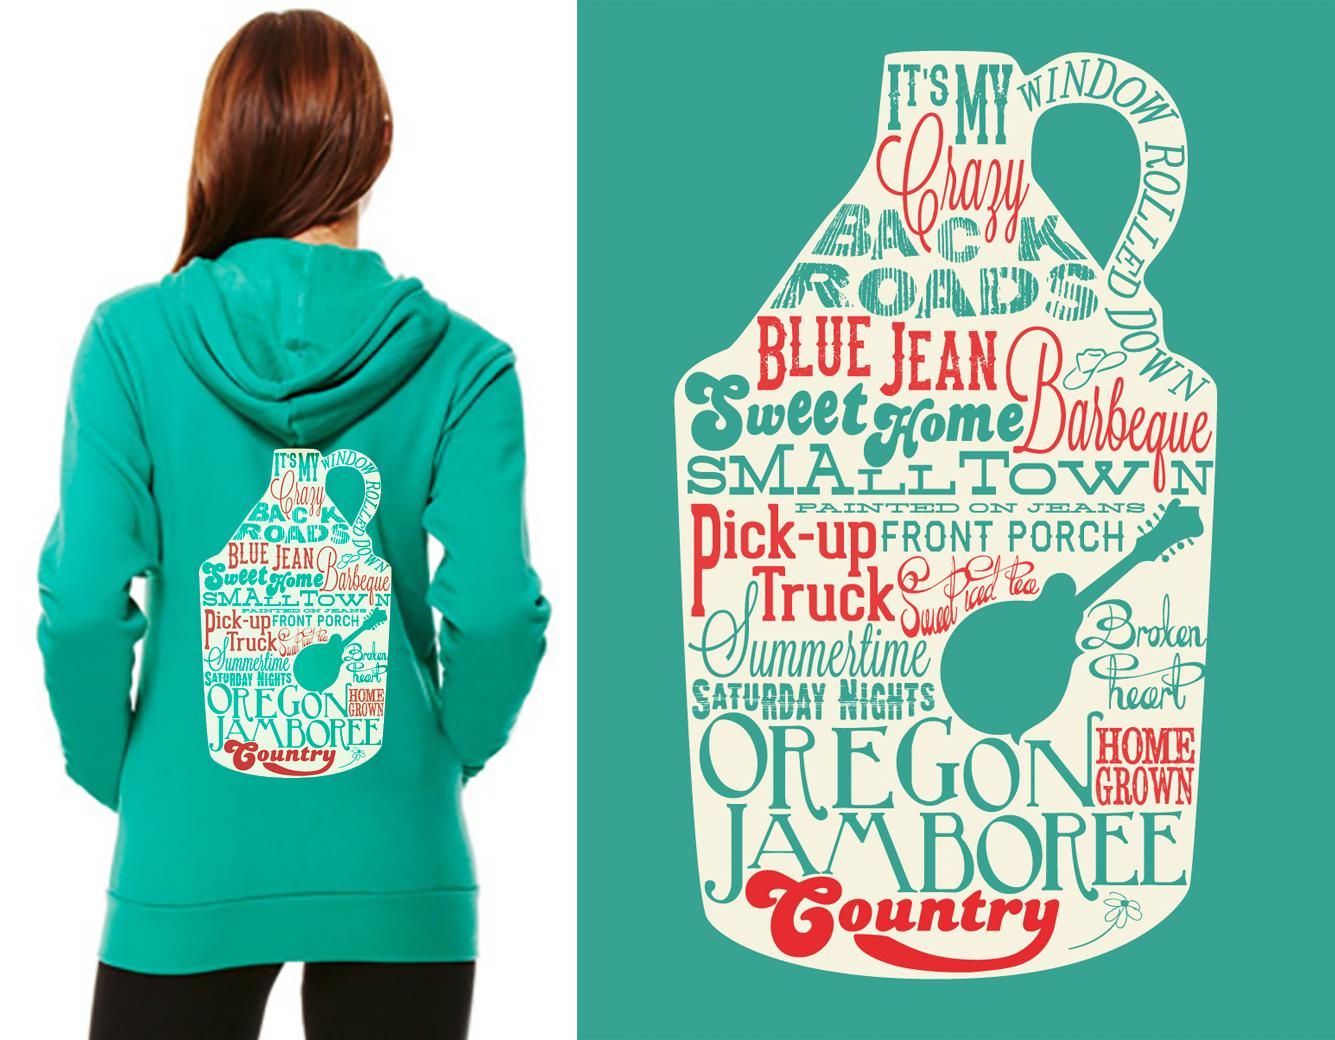 Oregon Jamboree hoodie design